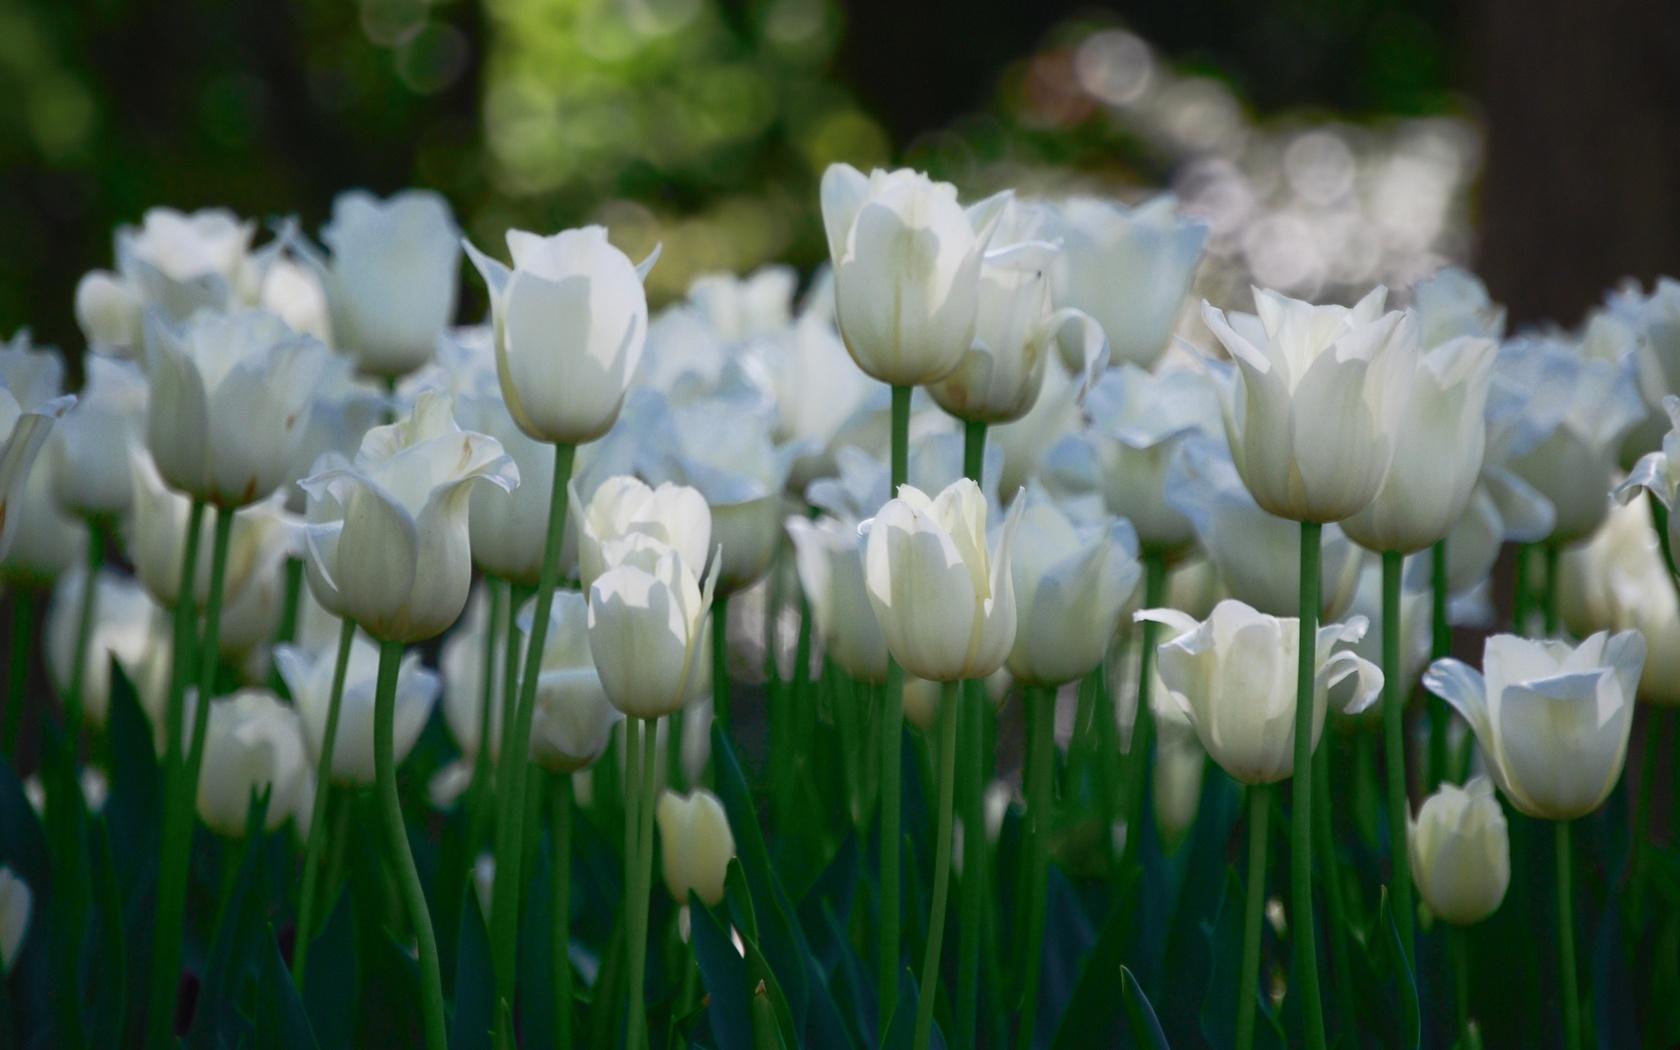 White tulips flower garden wallpapers white tulips flower garden click to view mightylinksfo